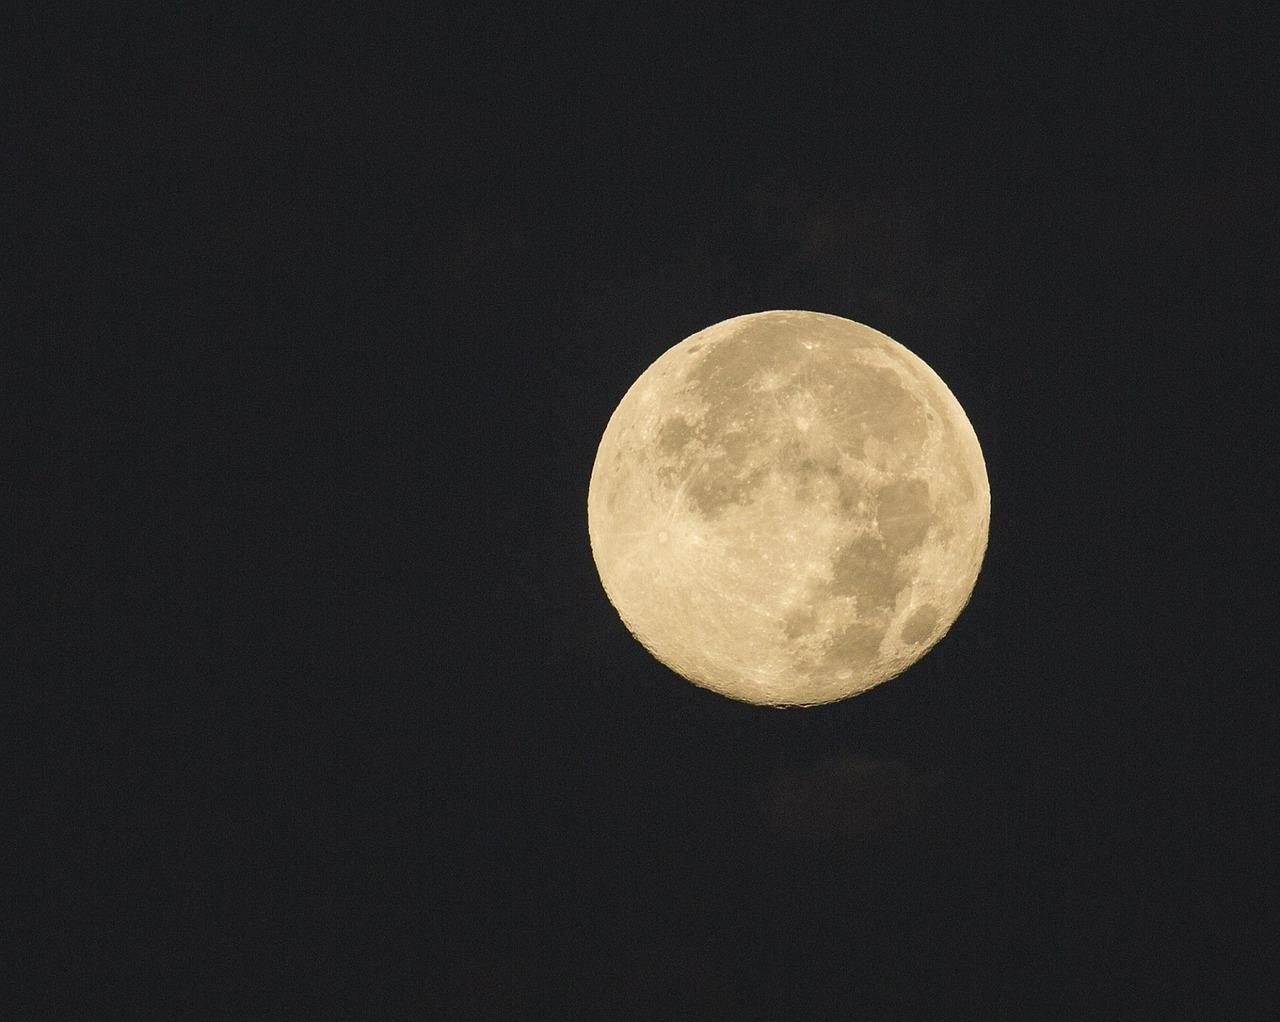 full-moon-912130_1280